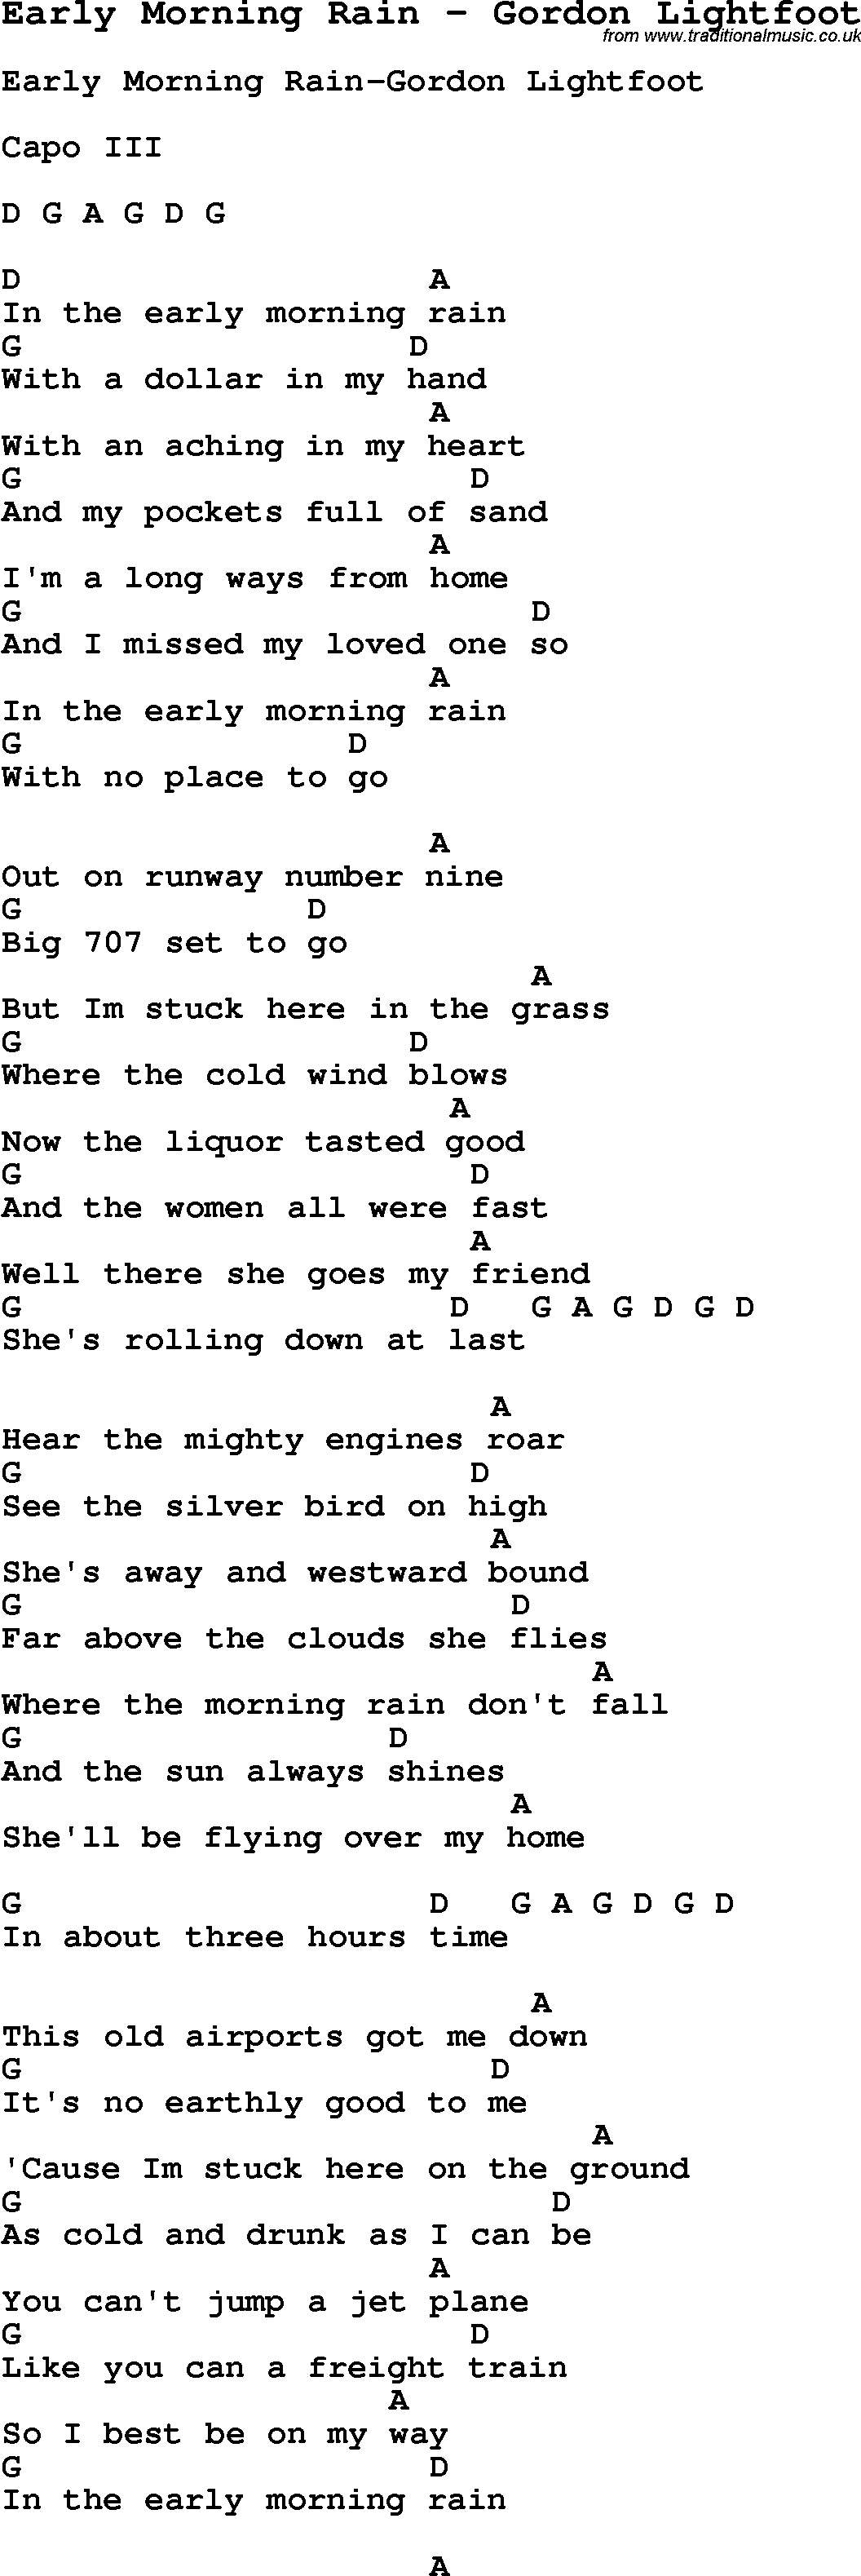 Song early morning rain by gordon lightfoot with lyrics for vocal song early morning rain by gordon lightfoot song lyric for vocal performance plus accompaniment chords for ukulele guitar banjo etc hexwebz Choice Image